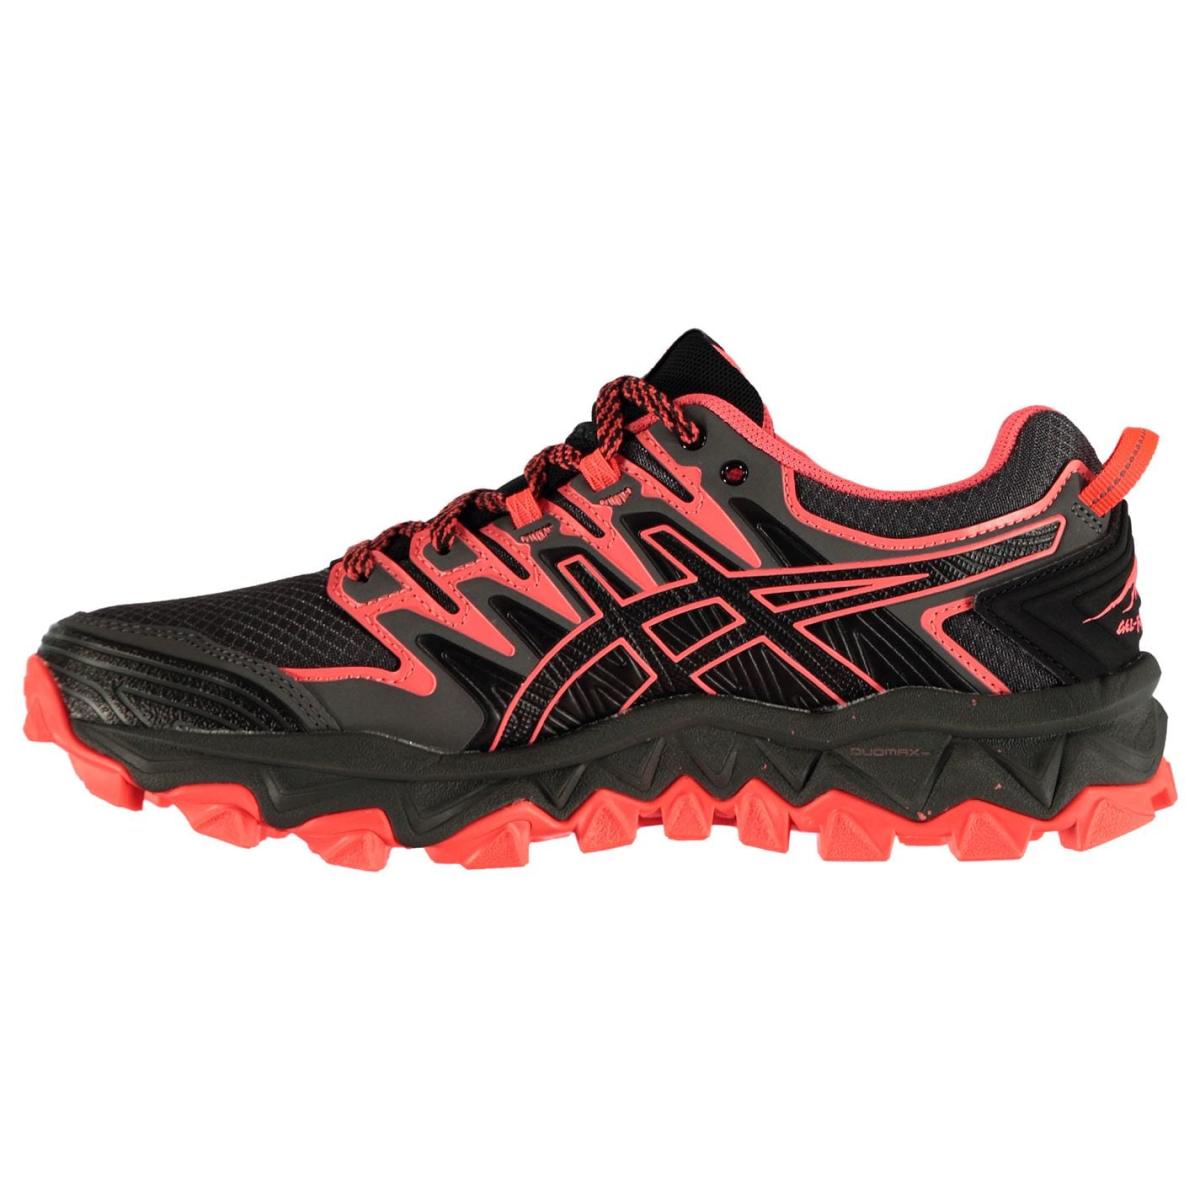 Asics-Gel-Fujitrabuco-Laufschuhe-Damen-Sportschuhe-Turnschuhe-Jogging-6015 Indexbild 5